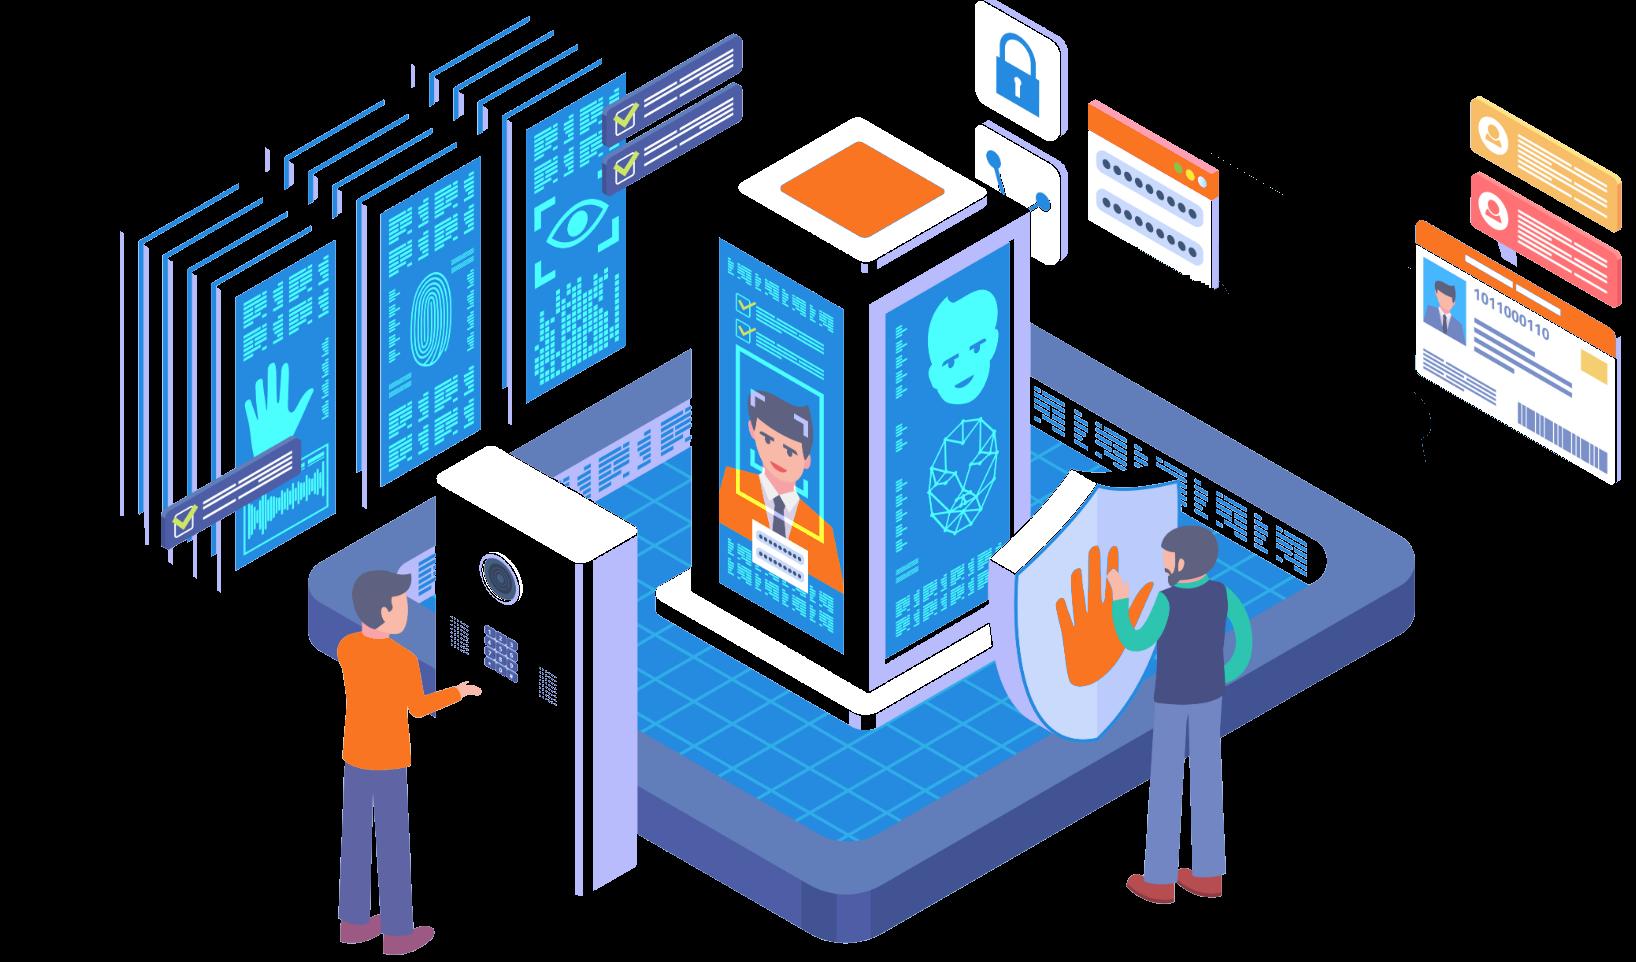 aml-software-image